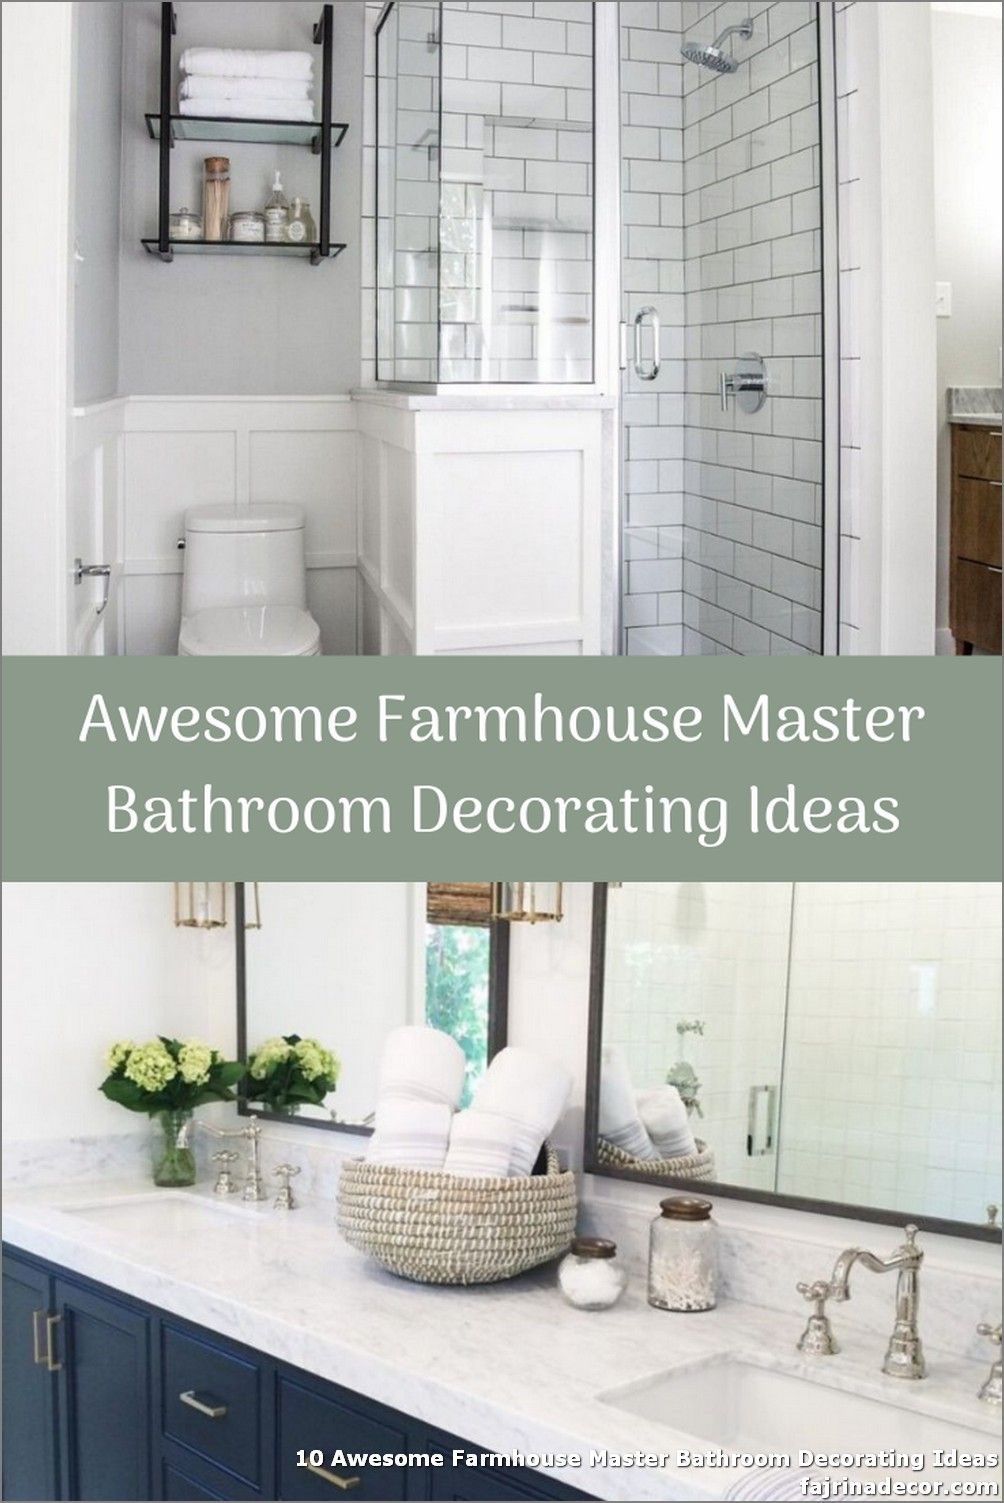 10 Awesome Farmhouse Master Bathroom Decorating Ideas In 2020 Master Bathroom Decor Farmhouse Master Bathroom Bathroom Decor